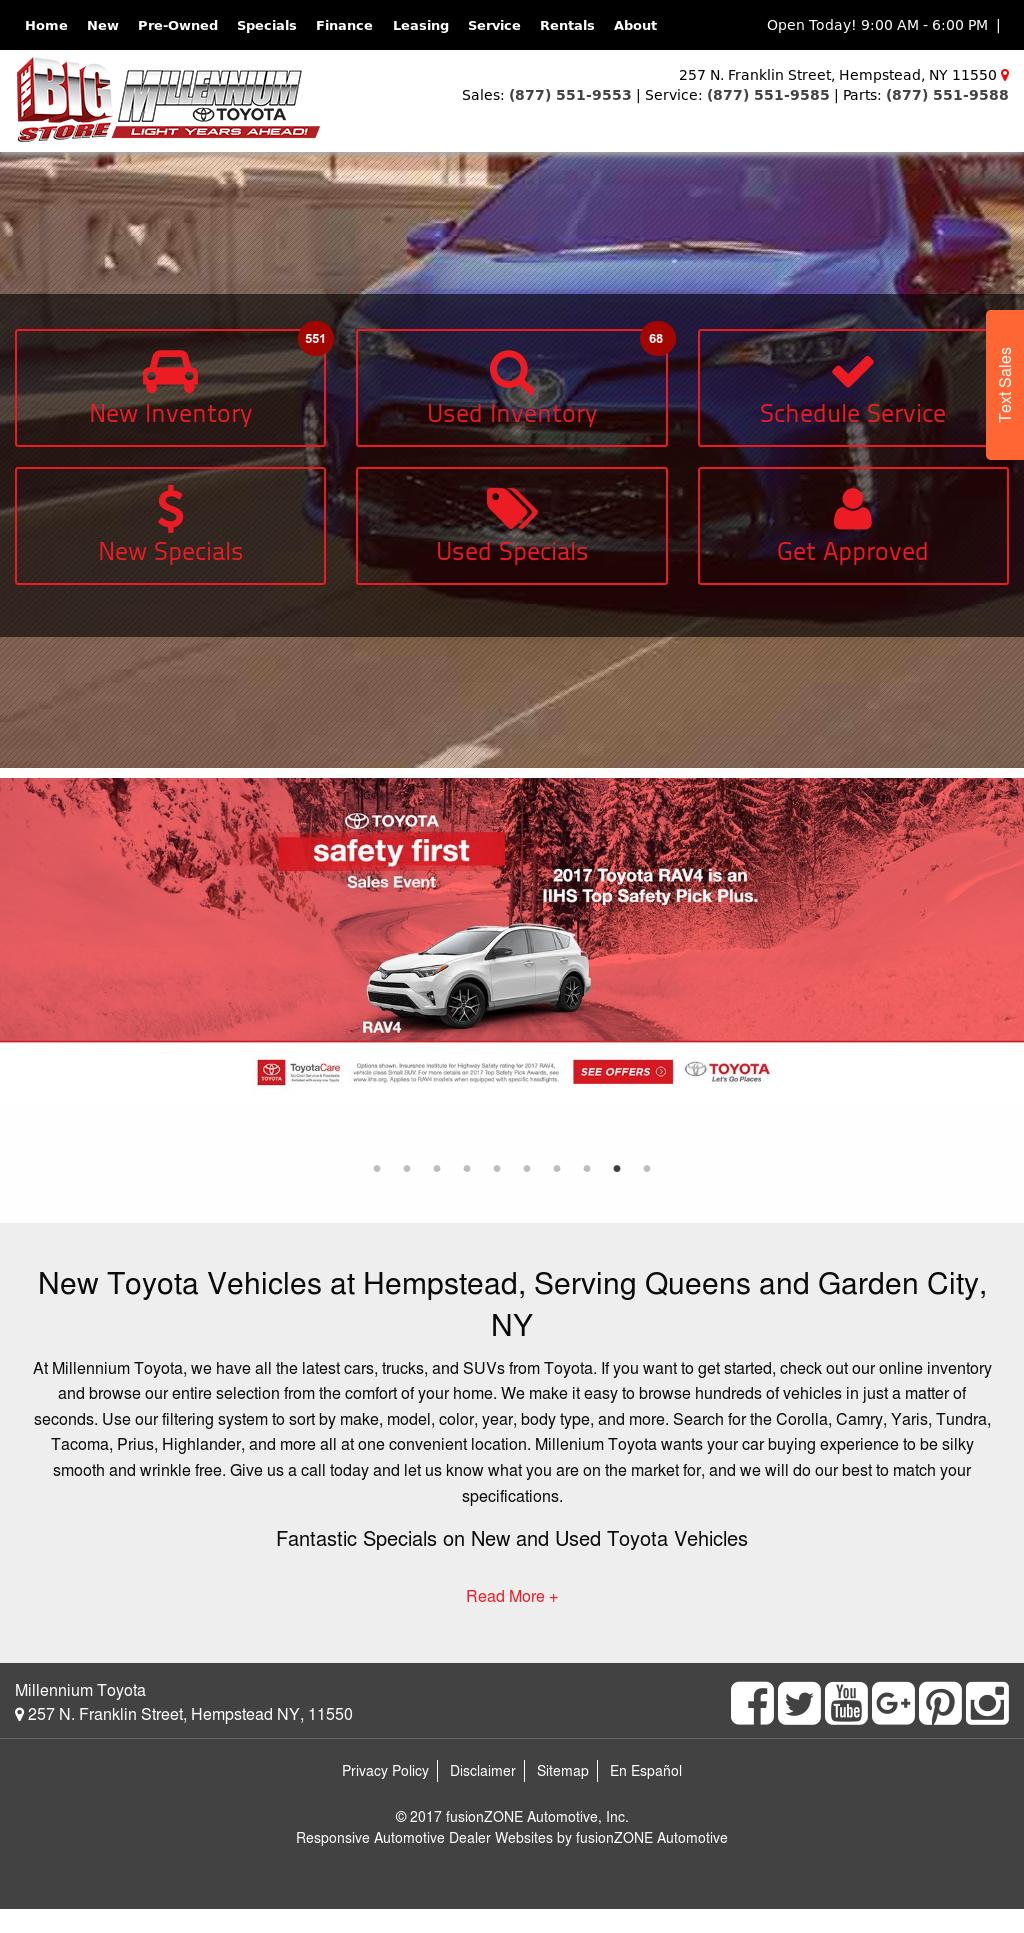 Millennium Toyota Website History